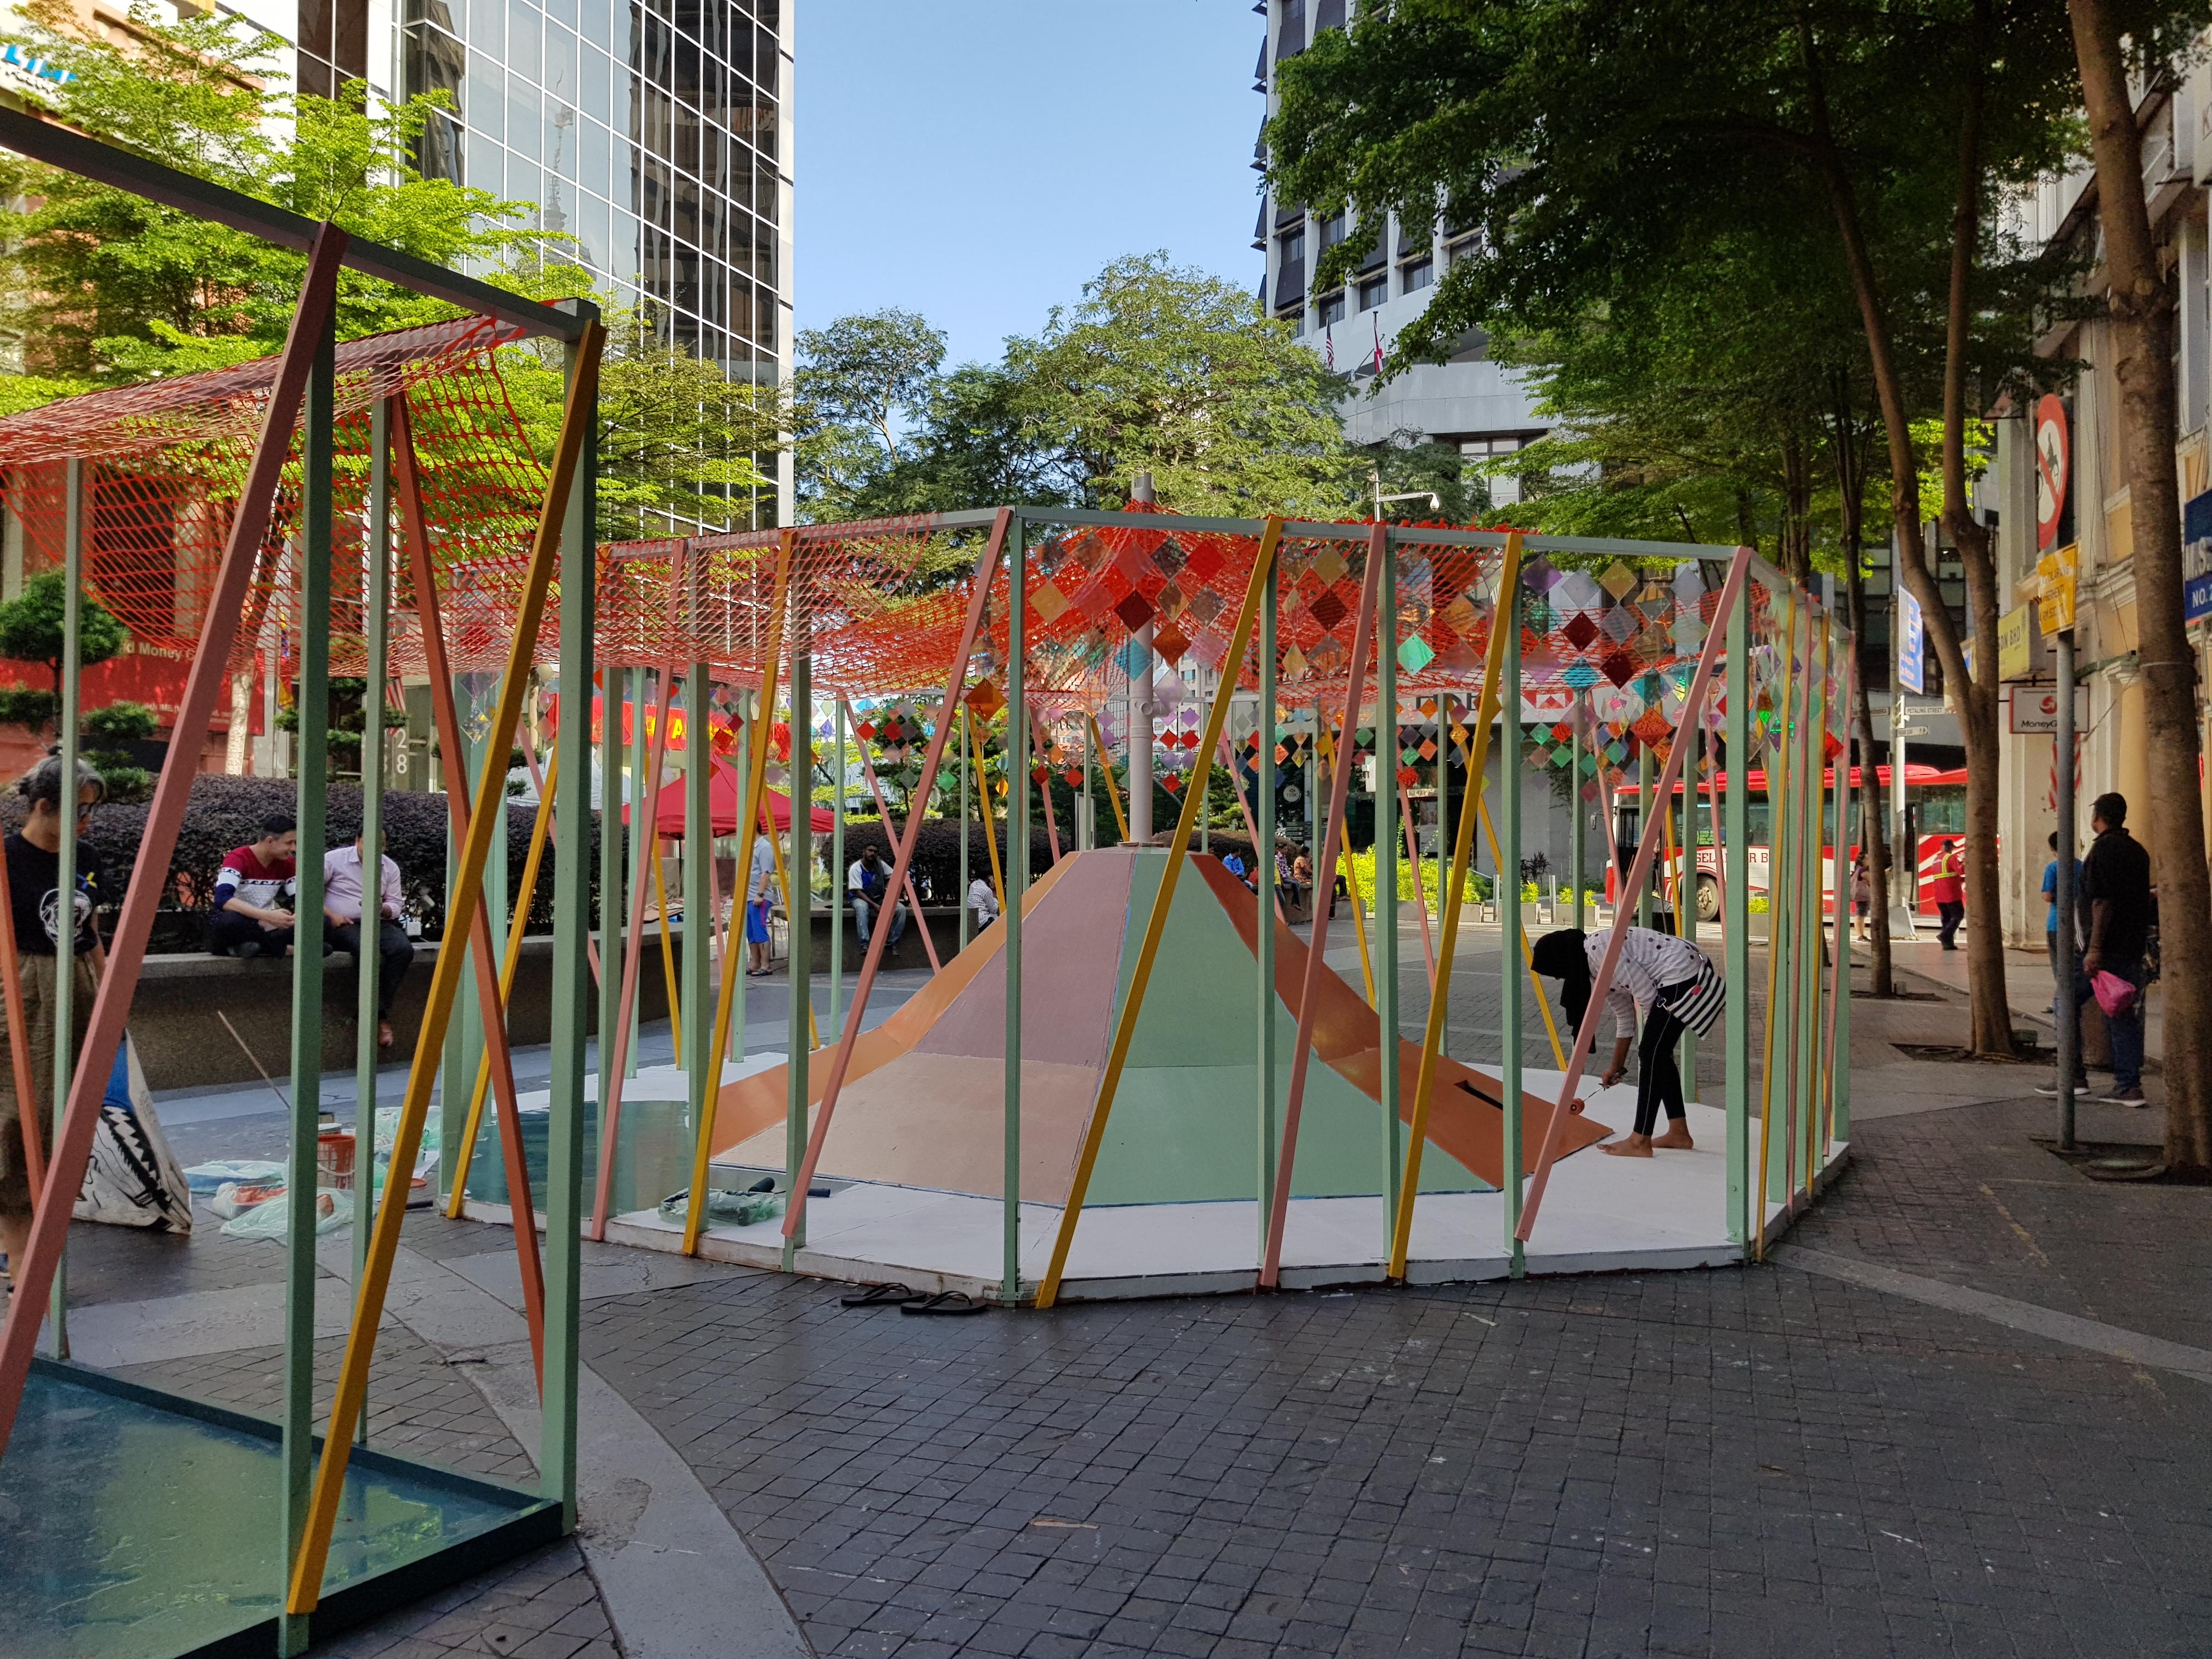 This week, you can see some installation art at Medan Pasar